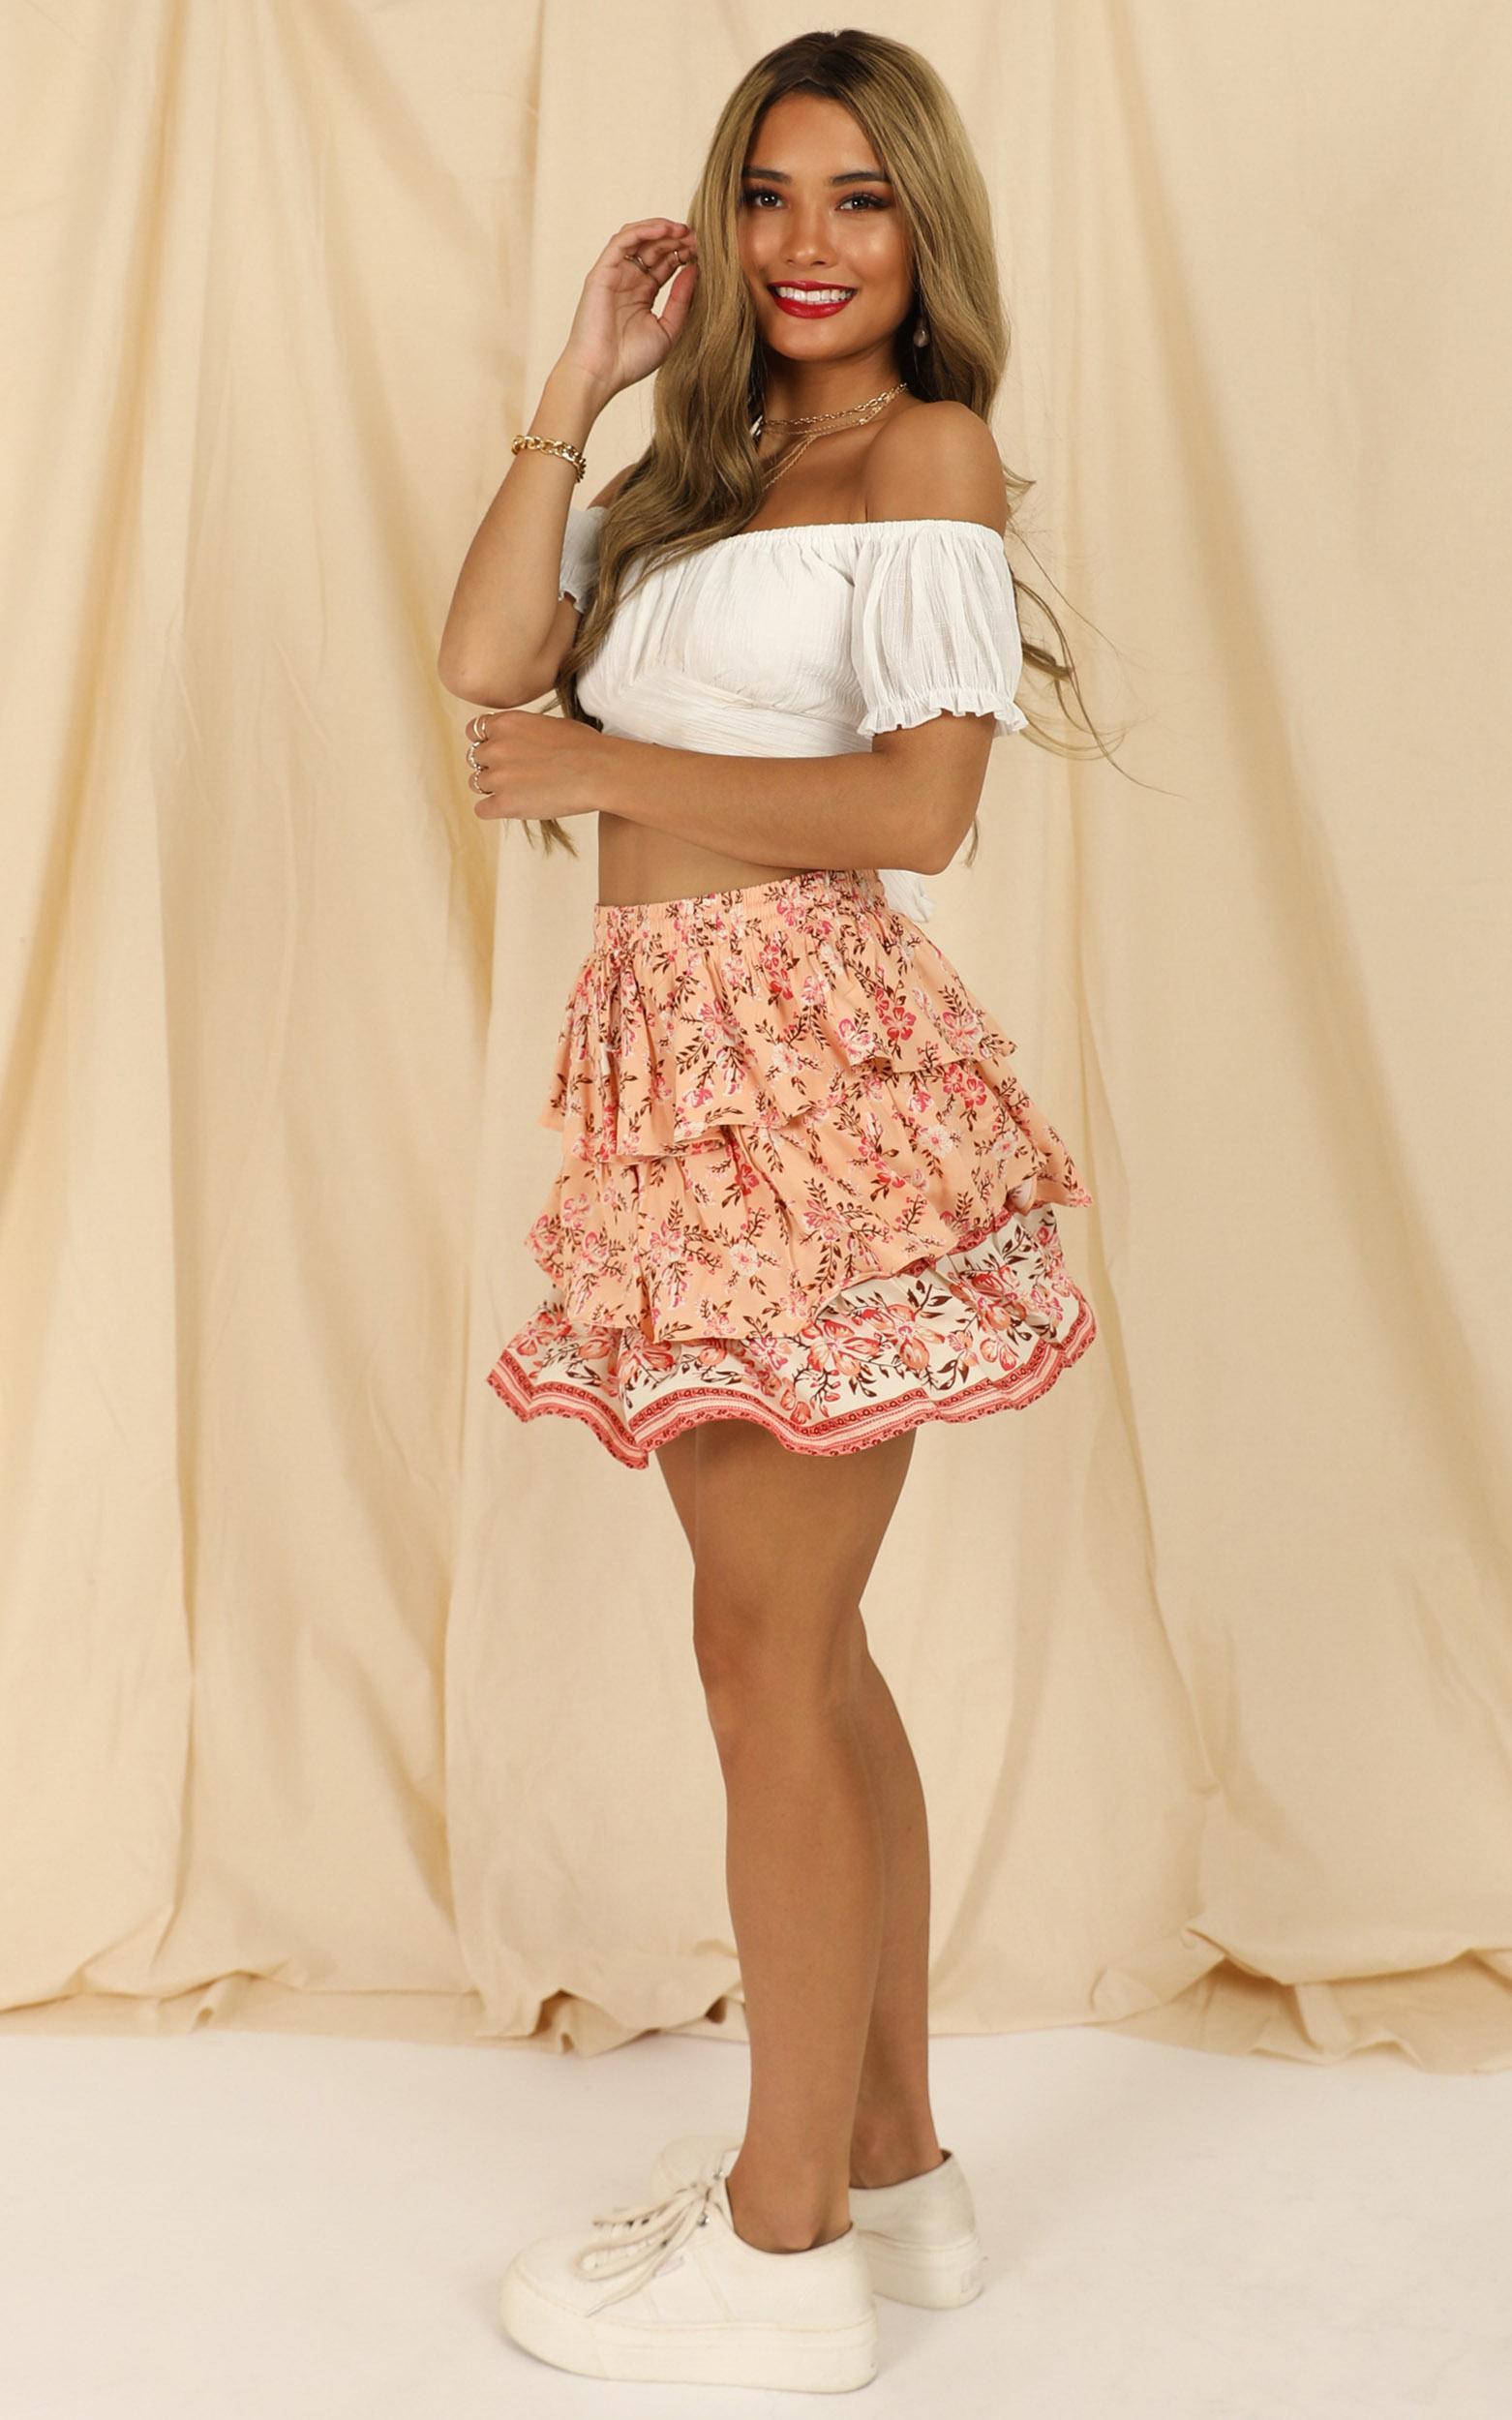 Lions Tail Skirt In Orange Floral - 14 (XL), Orange, hi-res image number null